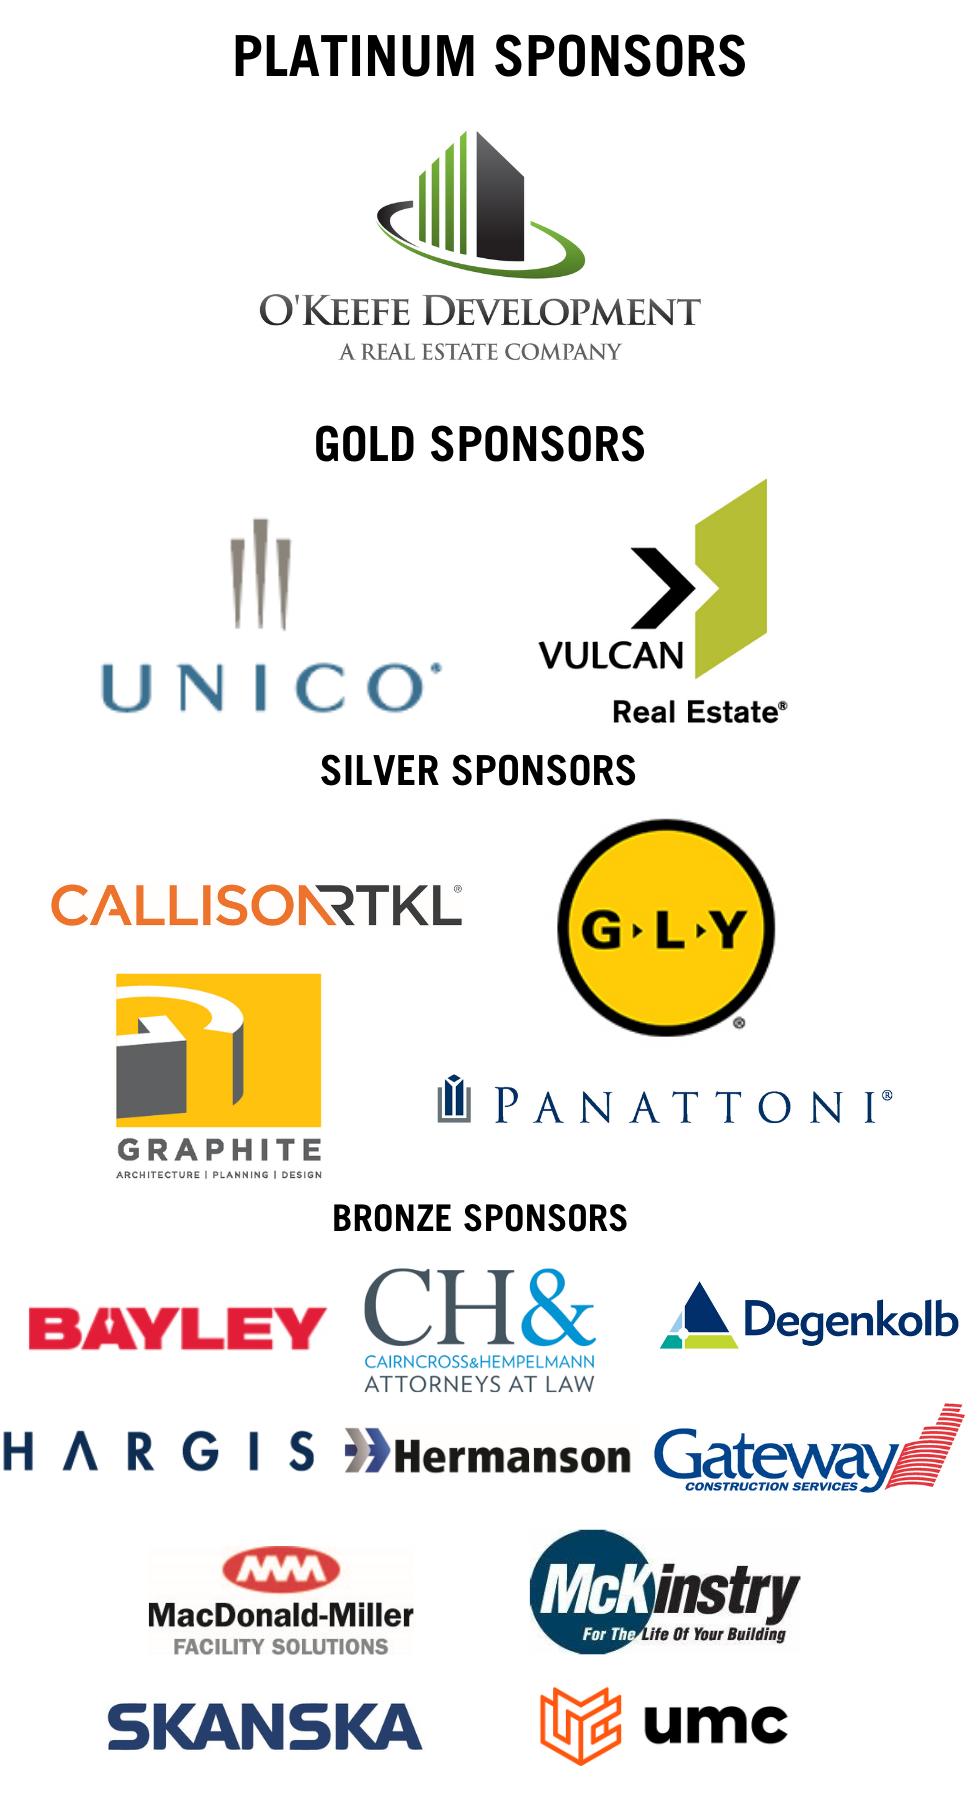 NOTS sponsors